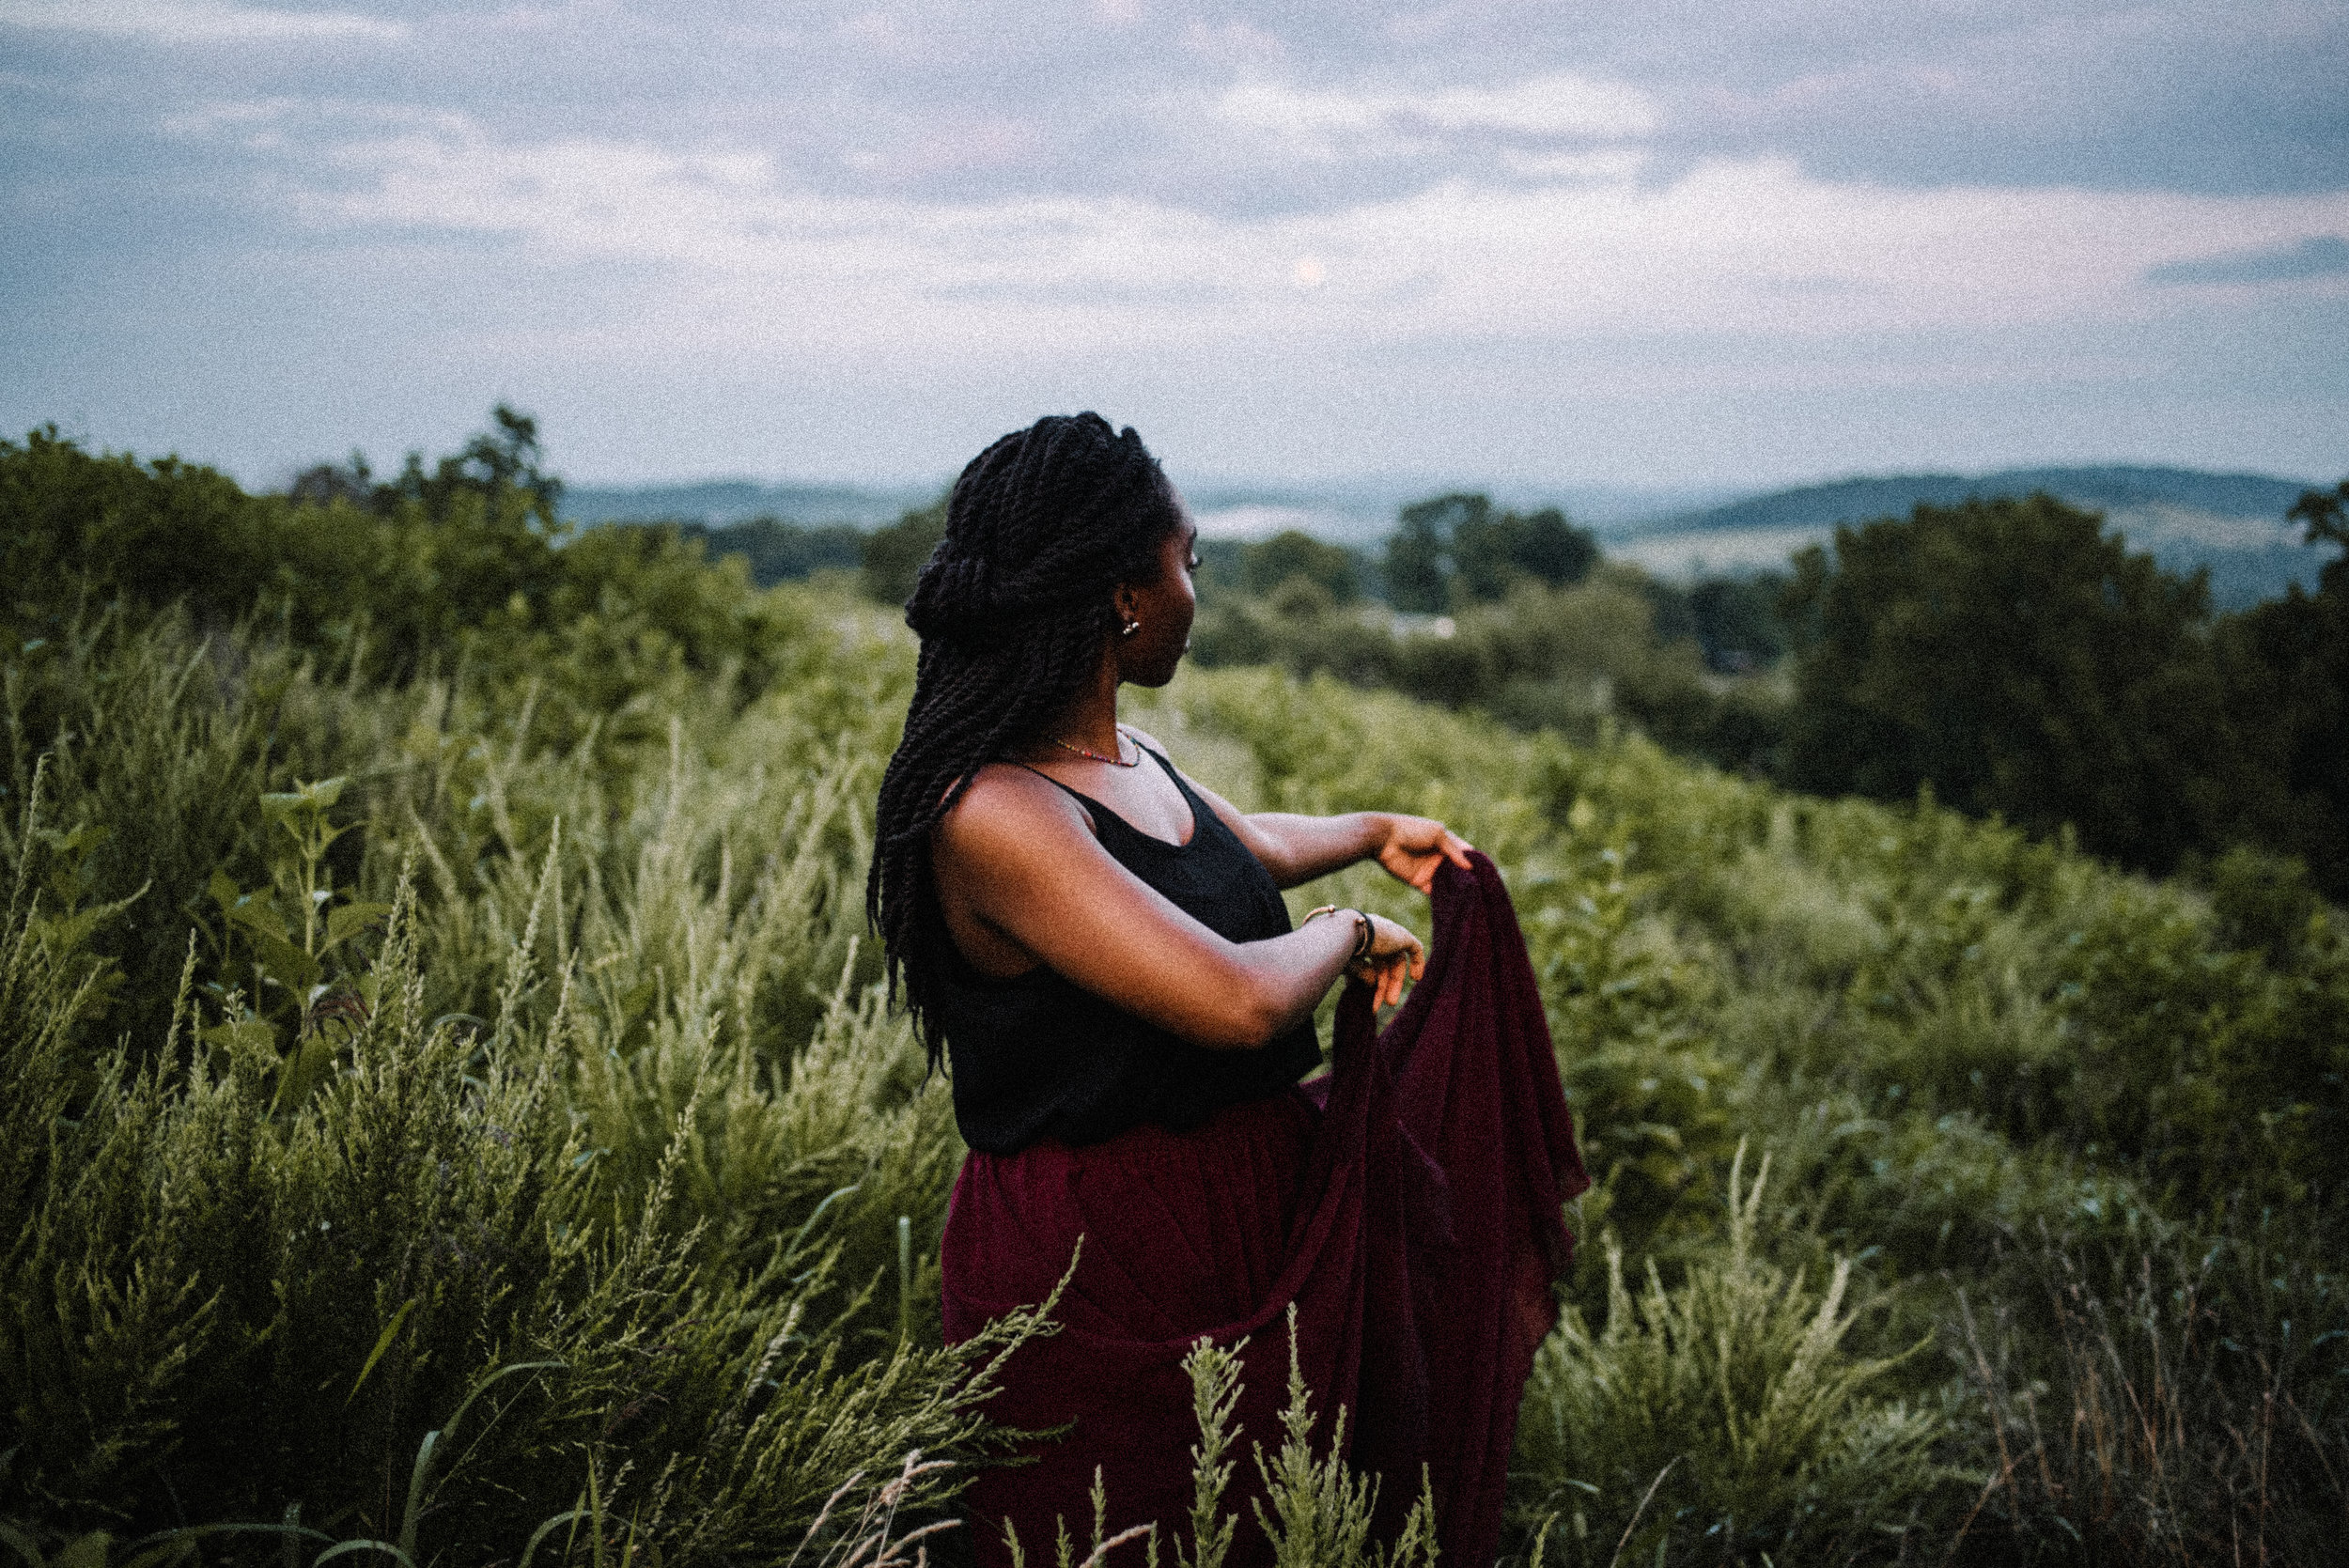 Mercy - White Sails Photography - adventure portraits - sky meadows state park 16.JPG